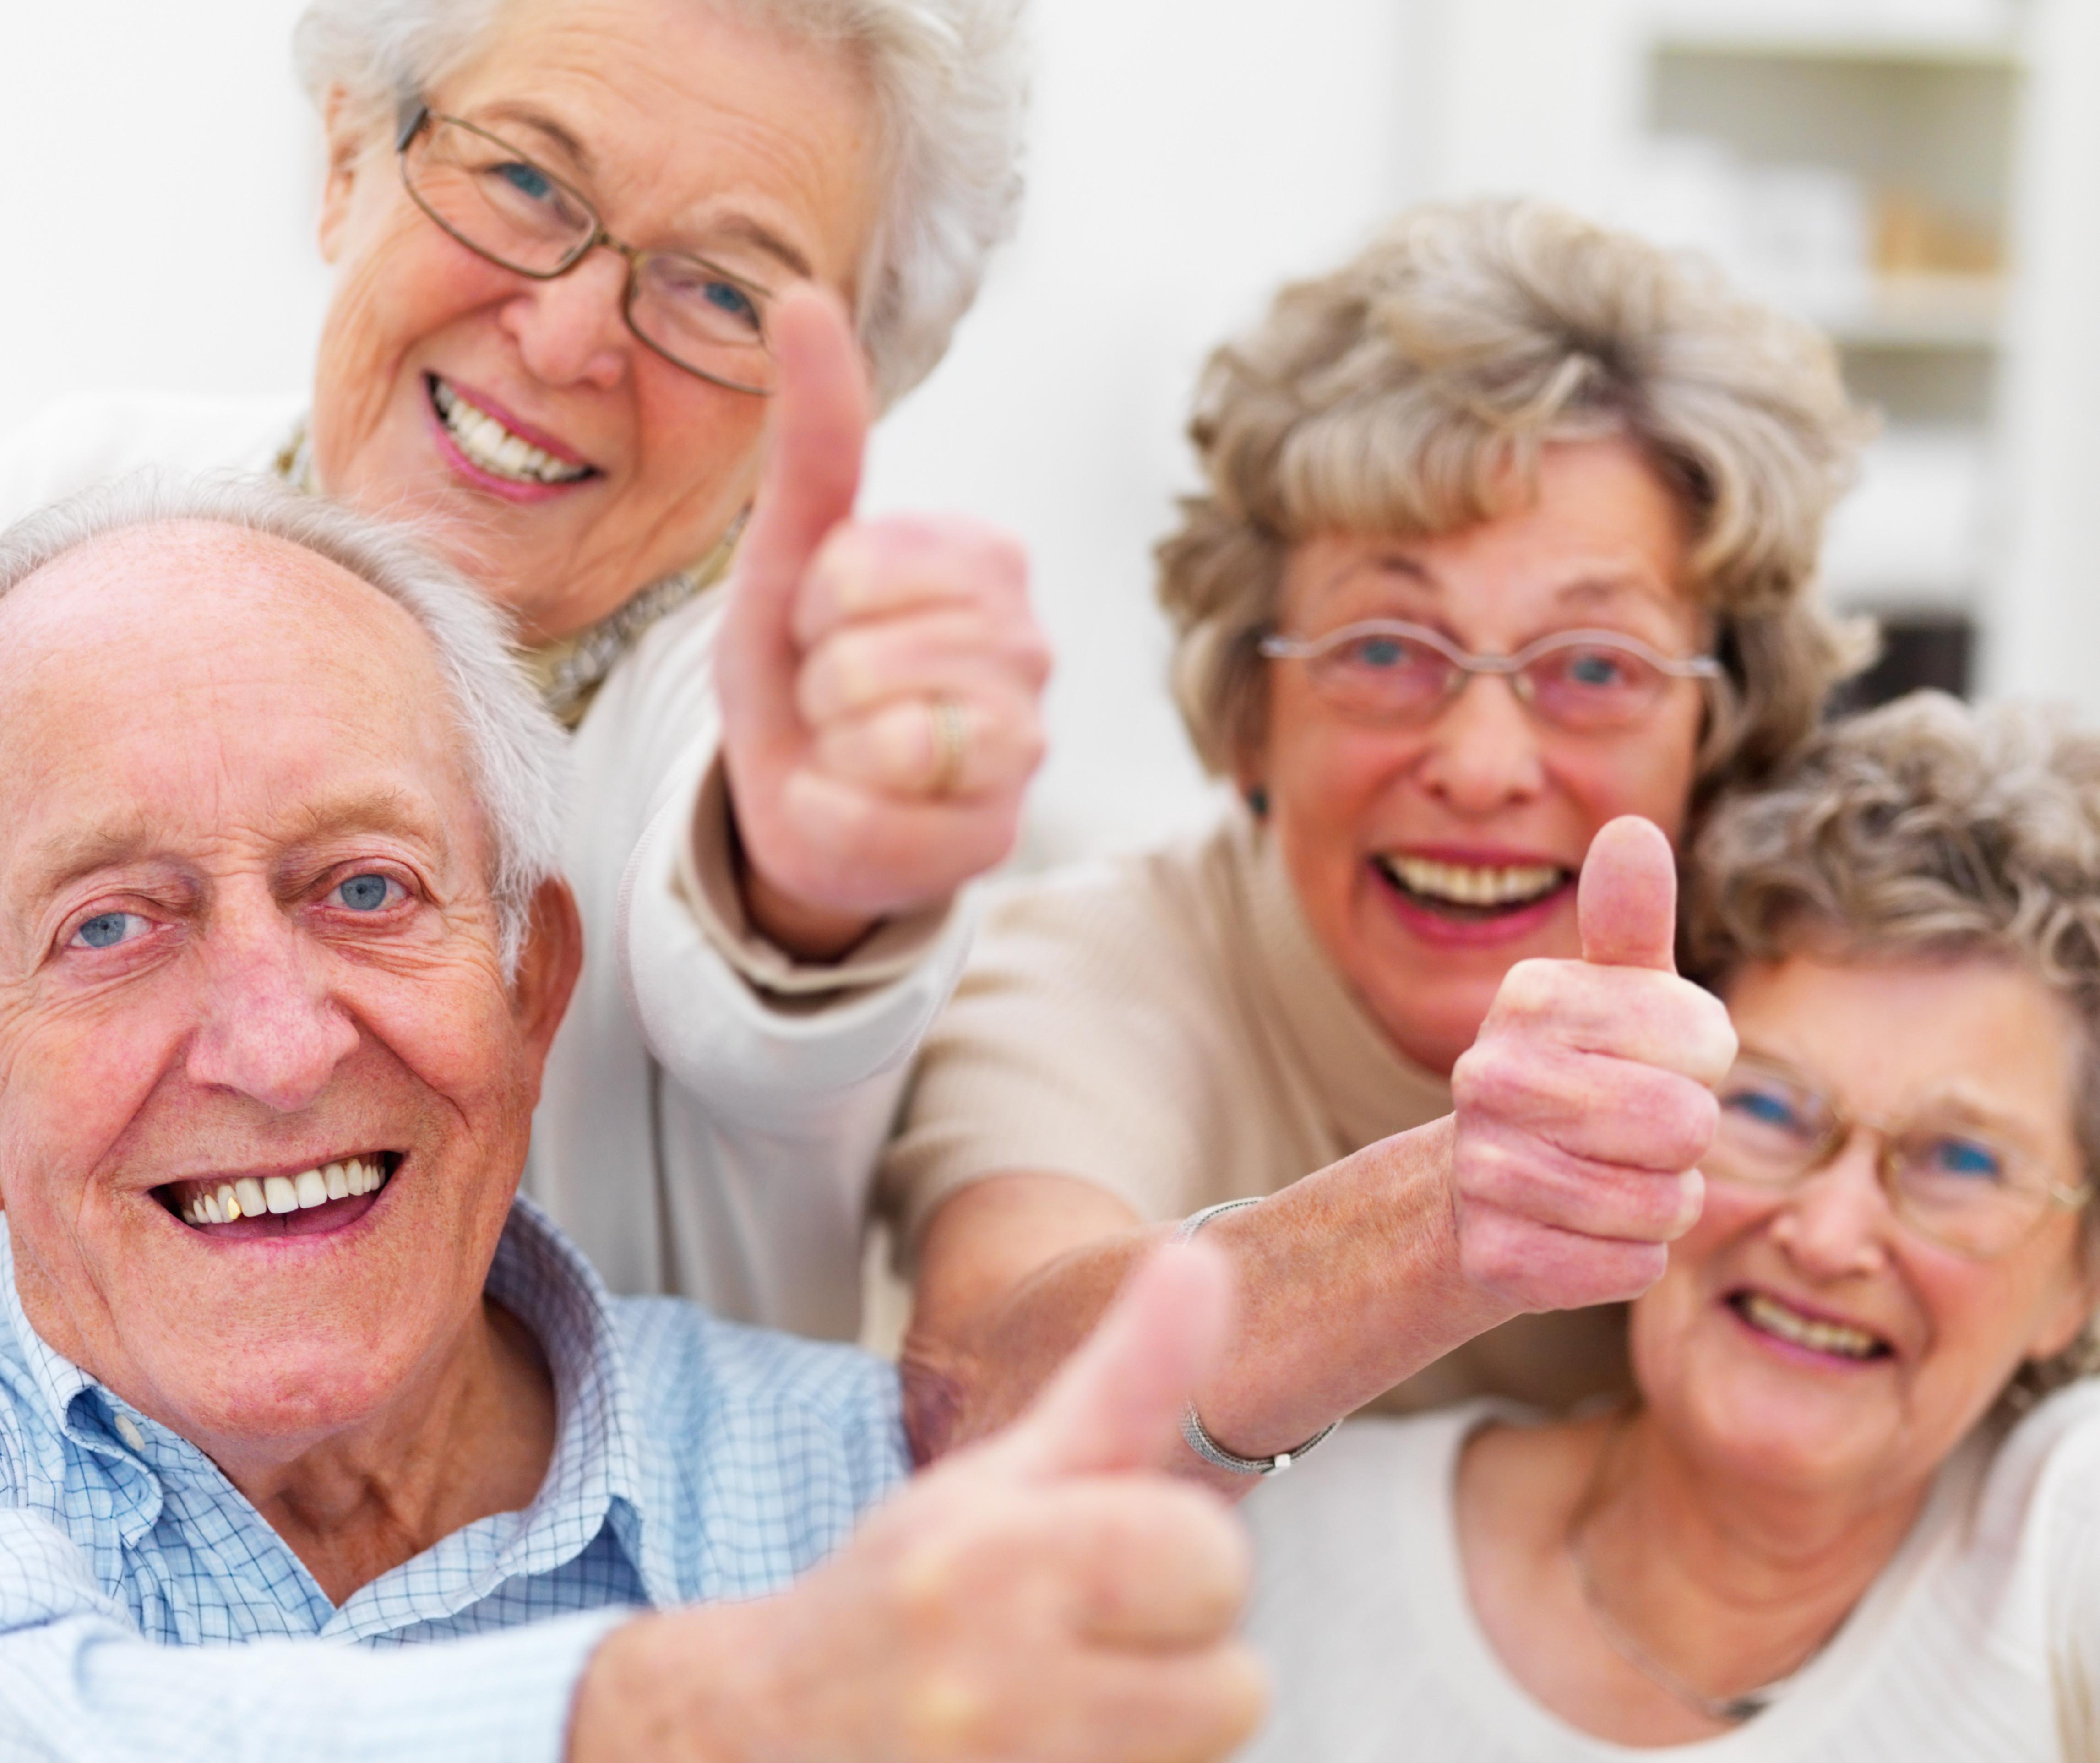 http://tlcsr.com/blog-Senior -Care-Staff-Thumbs-Up